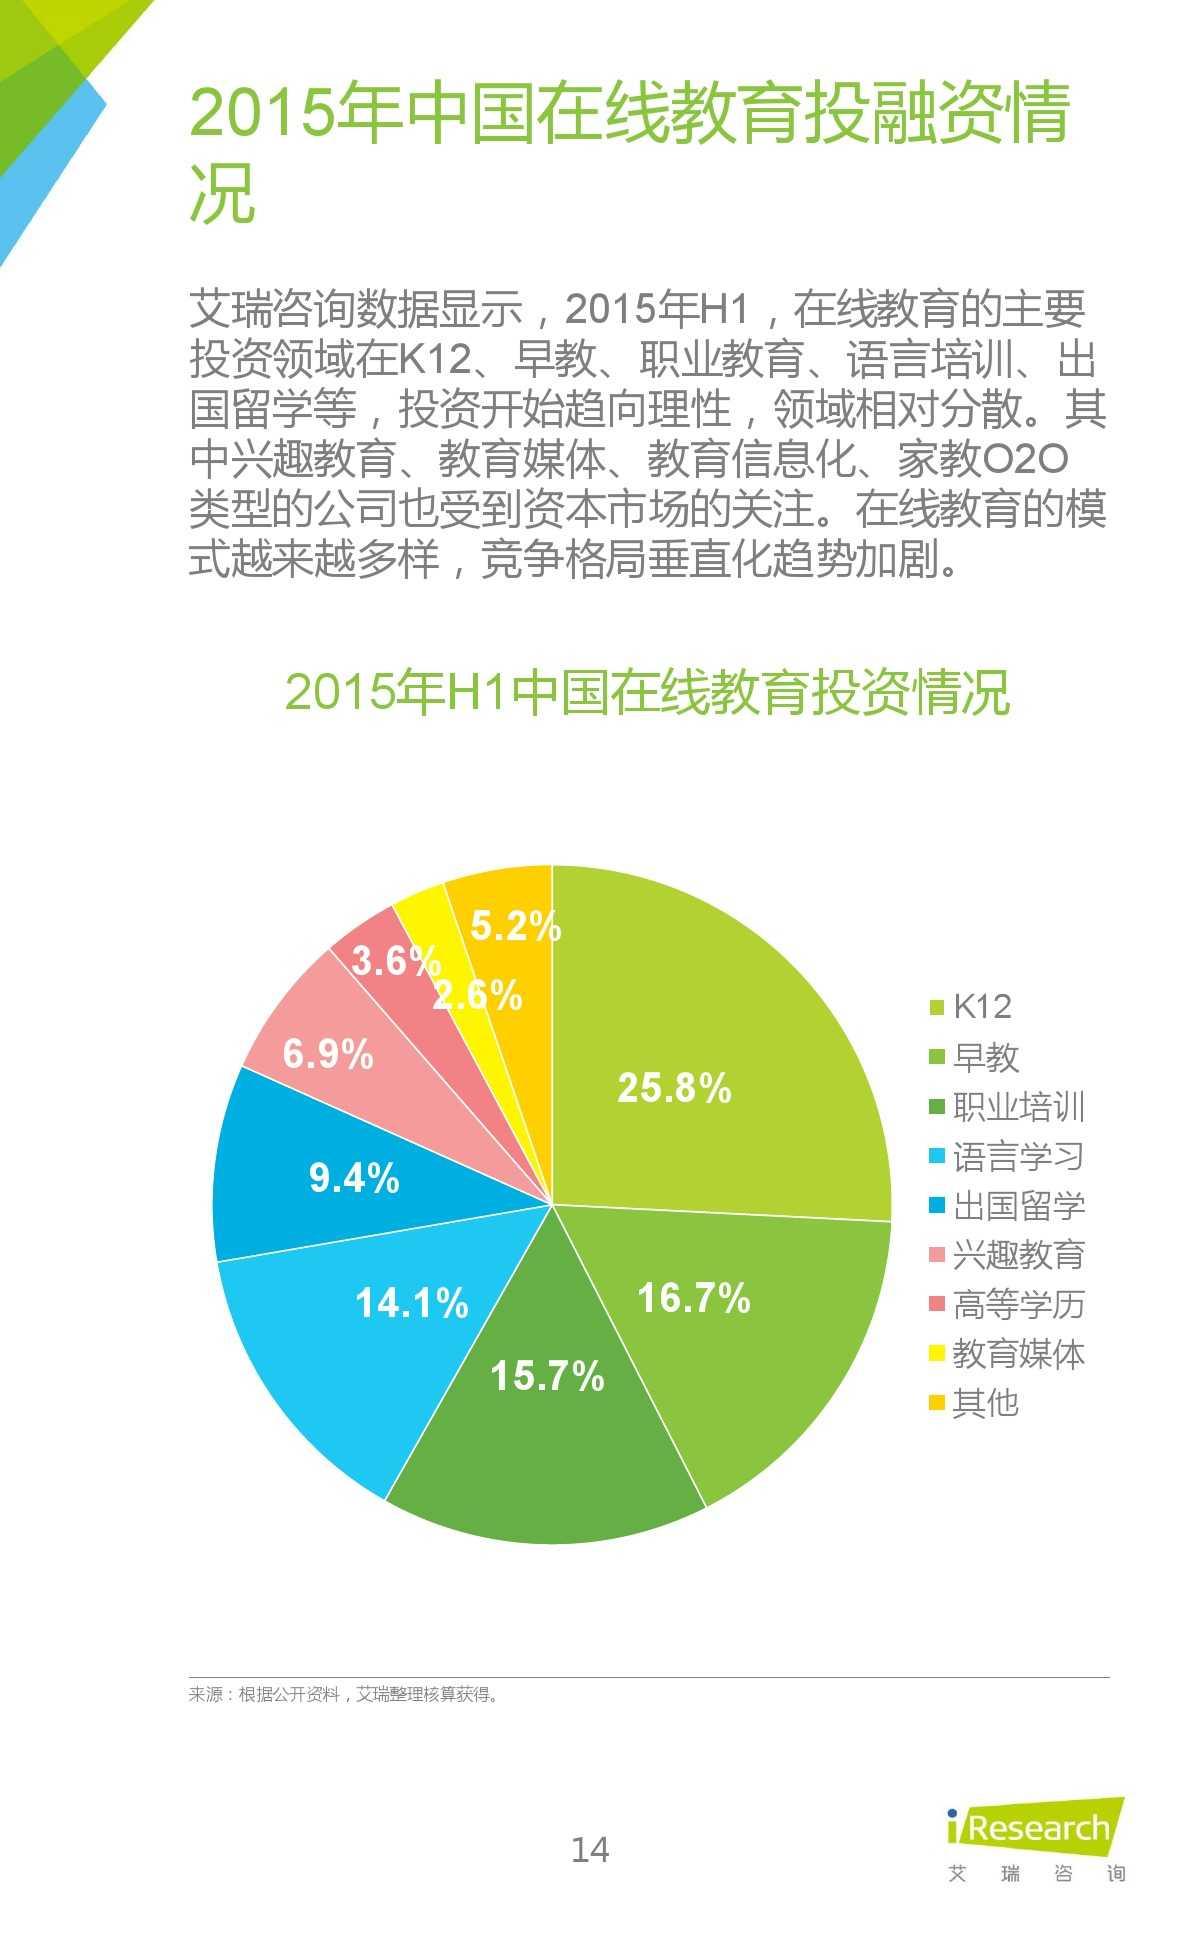 iResearch-2015年中国在线教育平台研究报告_000014